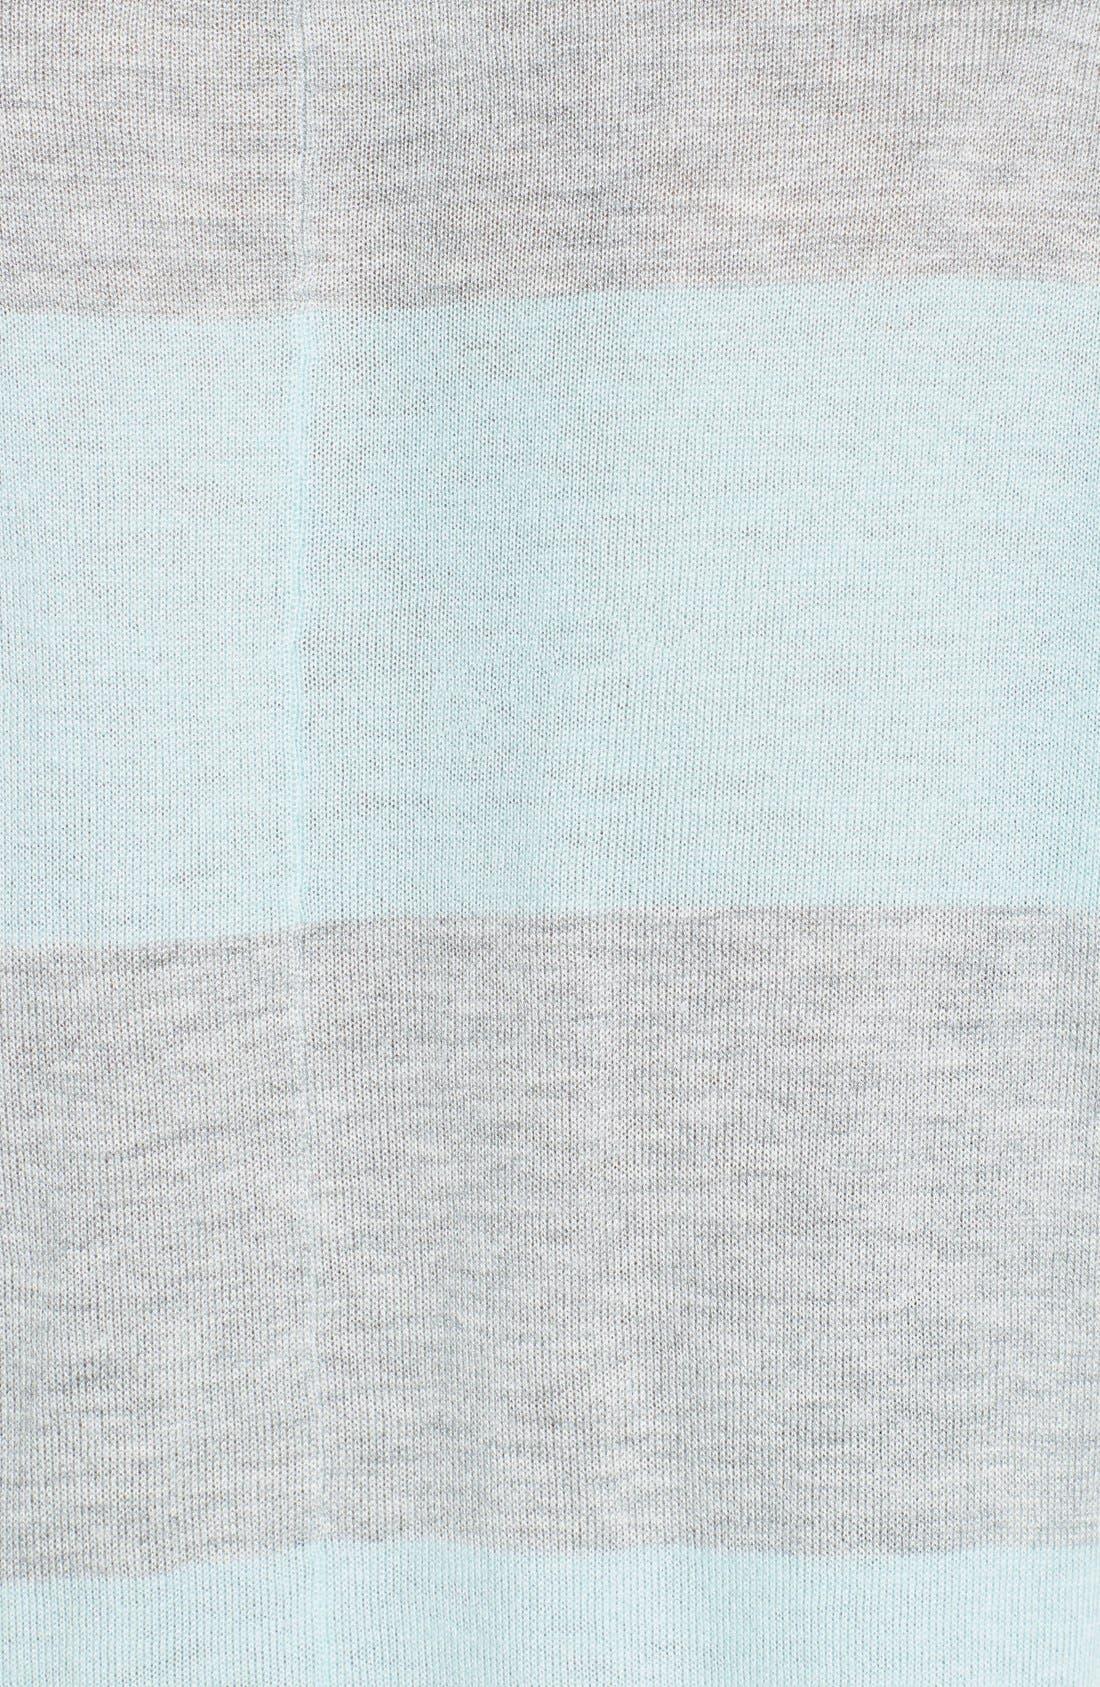 Alternate Image 3  - Splendid Stripe Dolman Sleeve Top